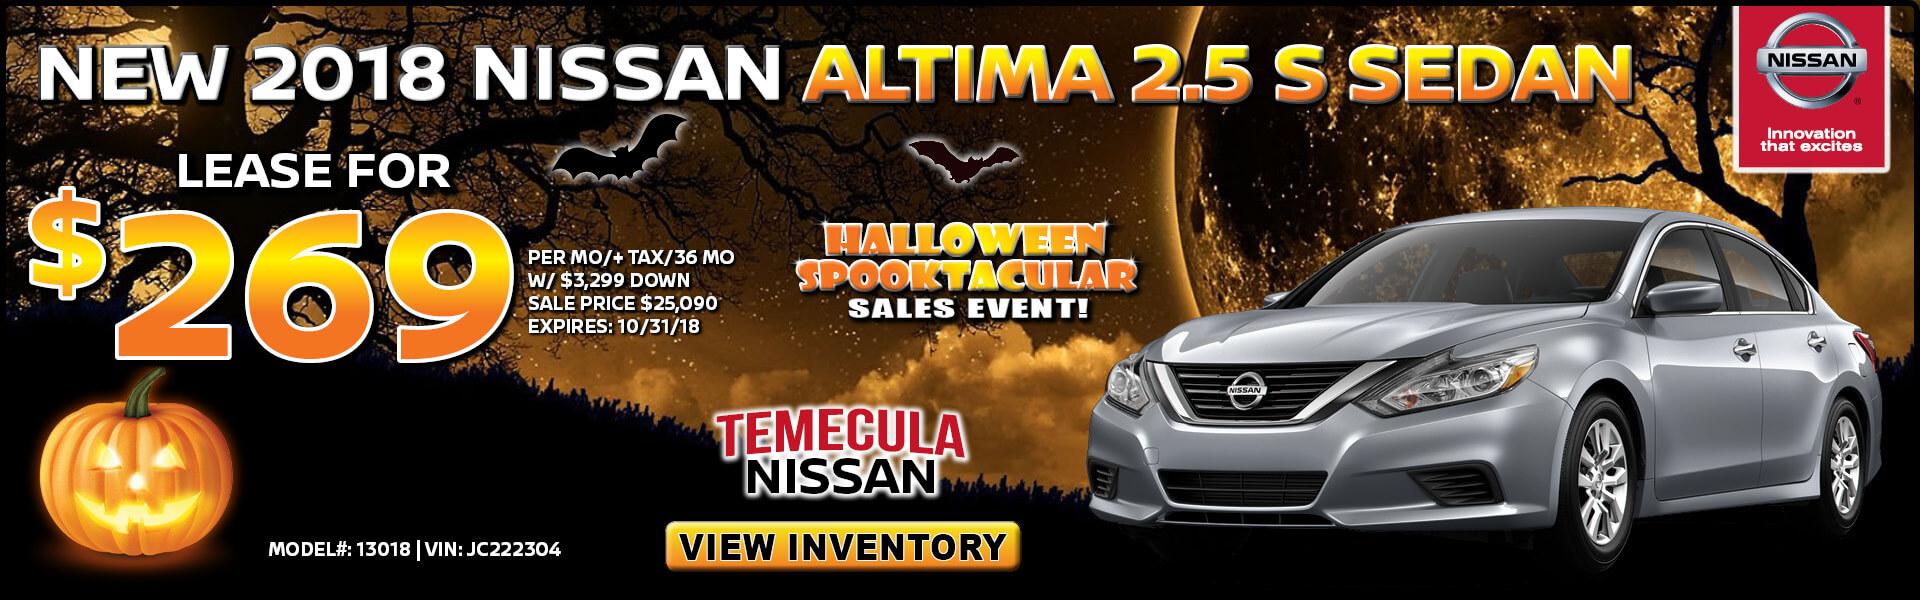 Nissan Altima $269 Lease